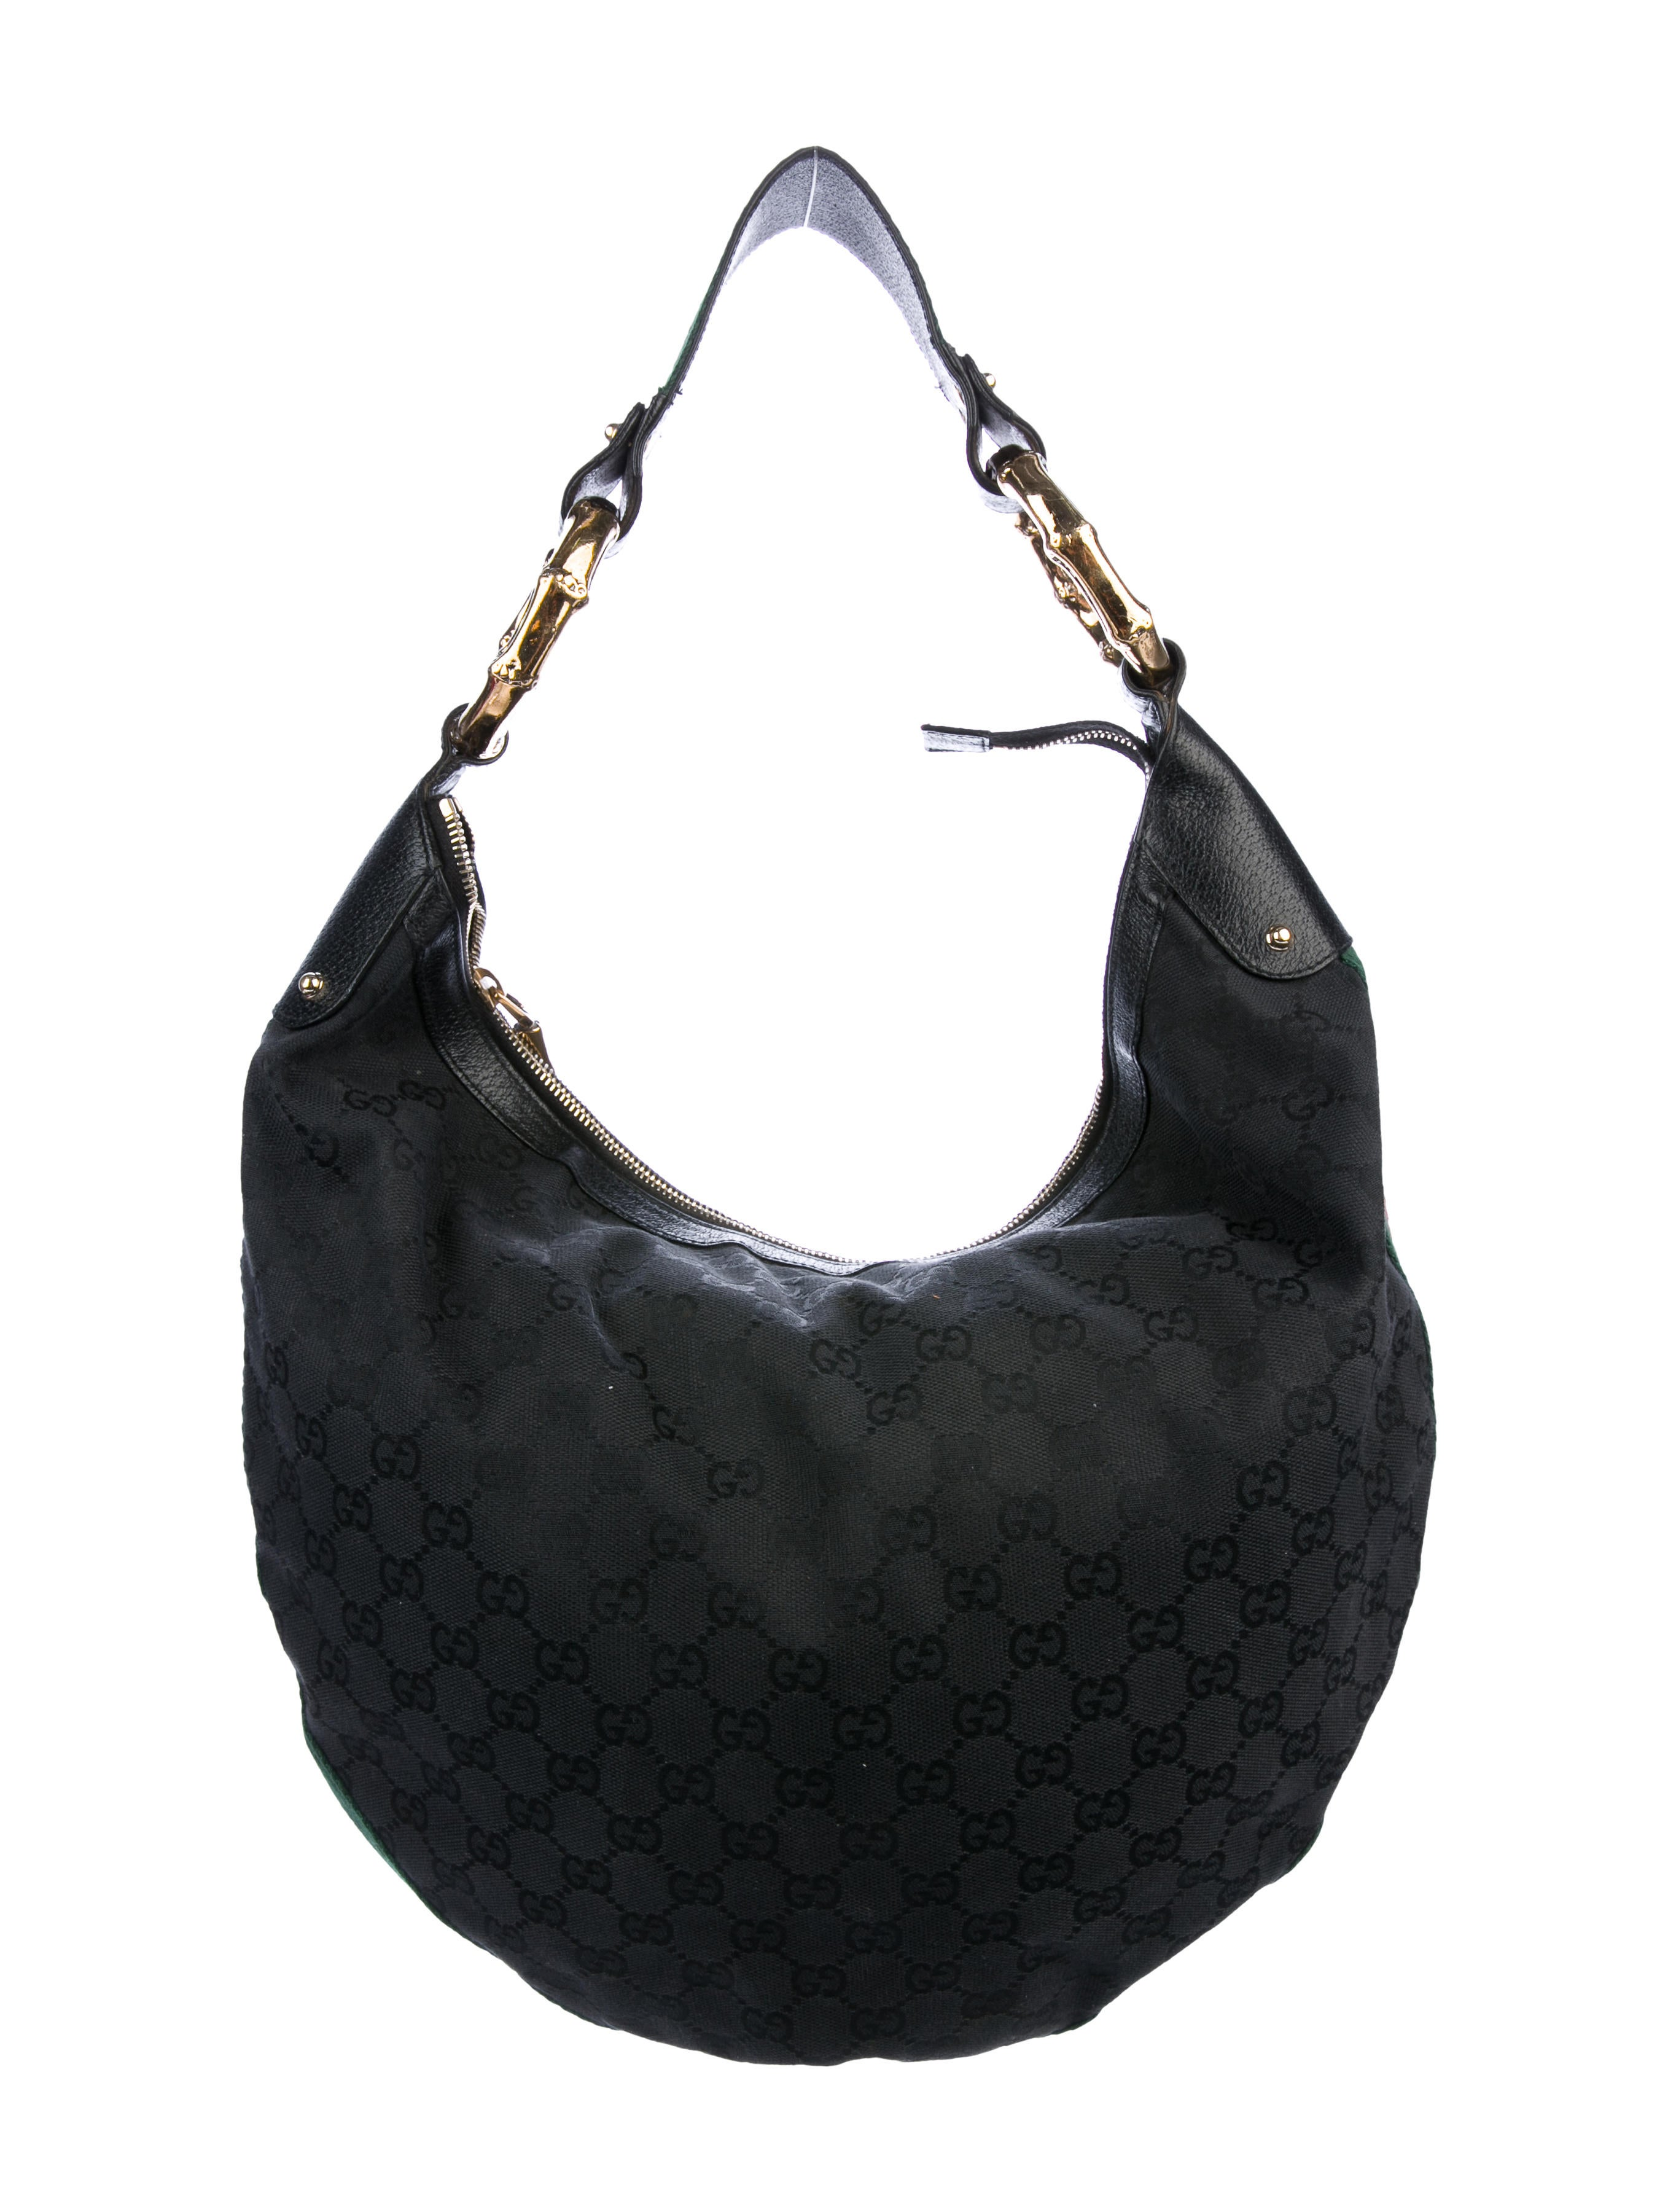 2dde15176 Gucci GG Canvas Bamboo Ring Hobo - Handbags - GUC231809 | The RealReal